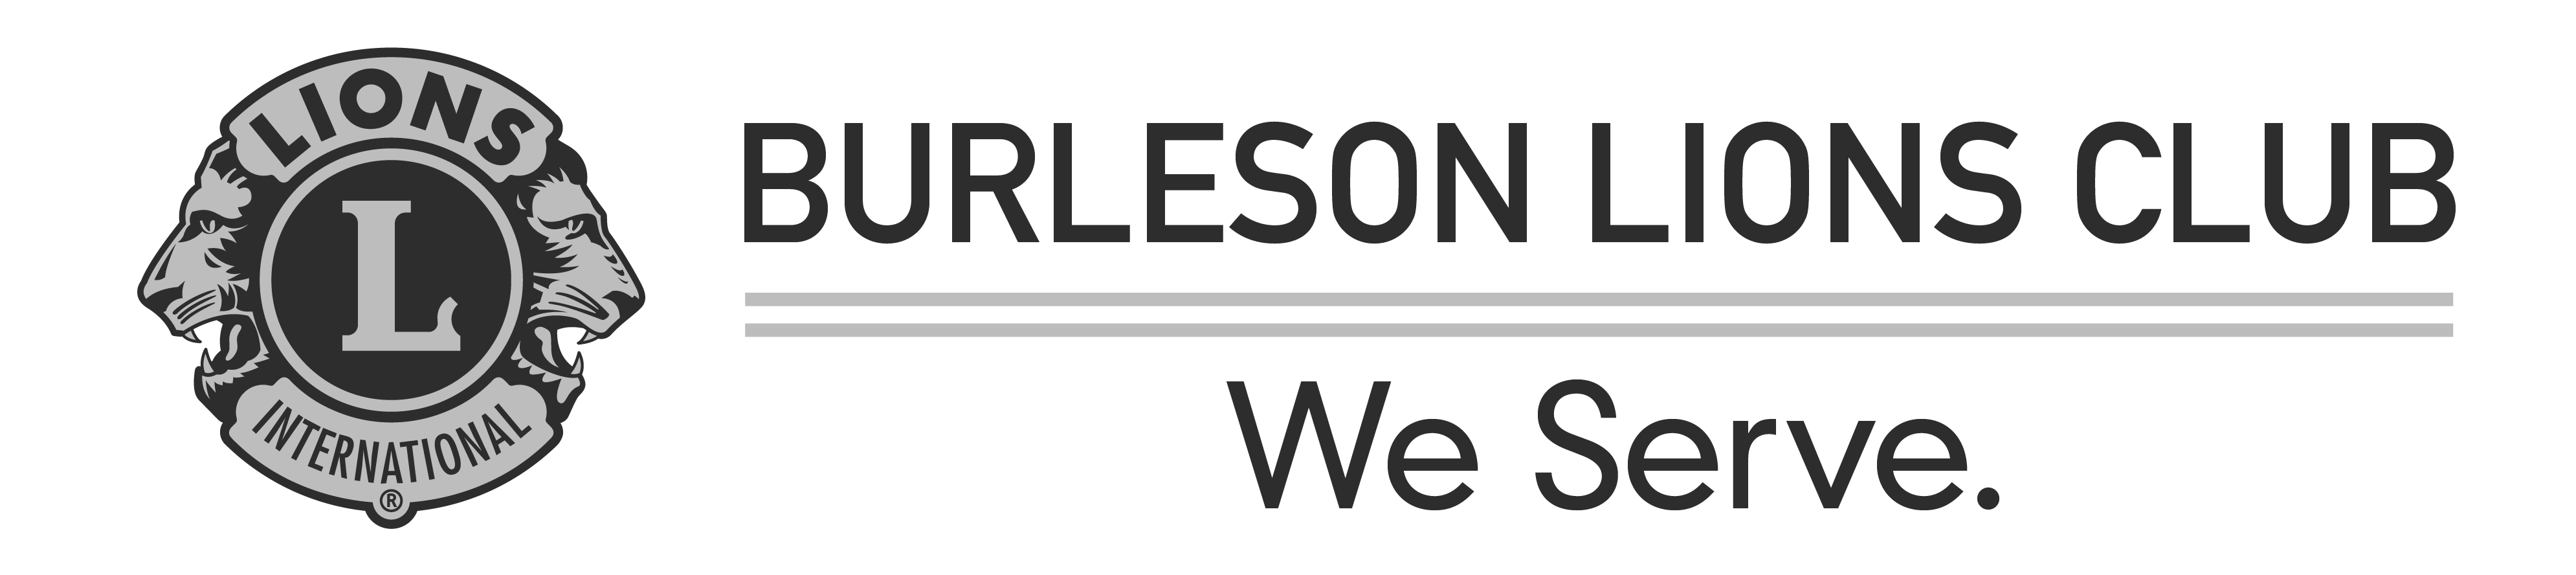 Burleson Lions Club Logo